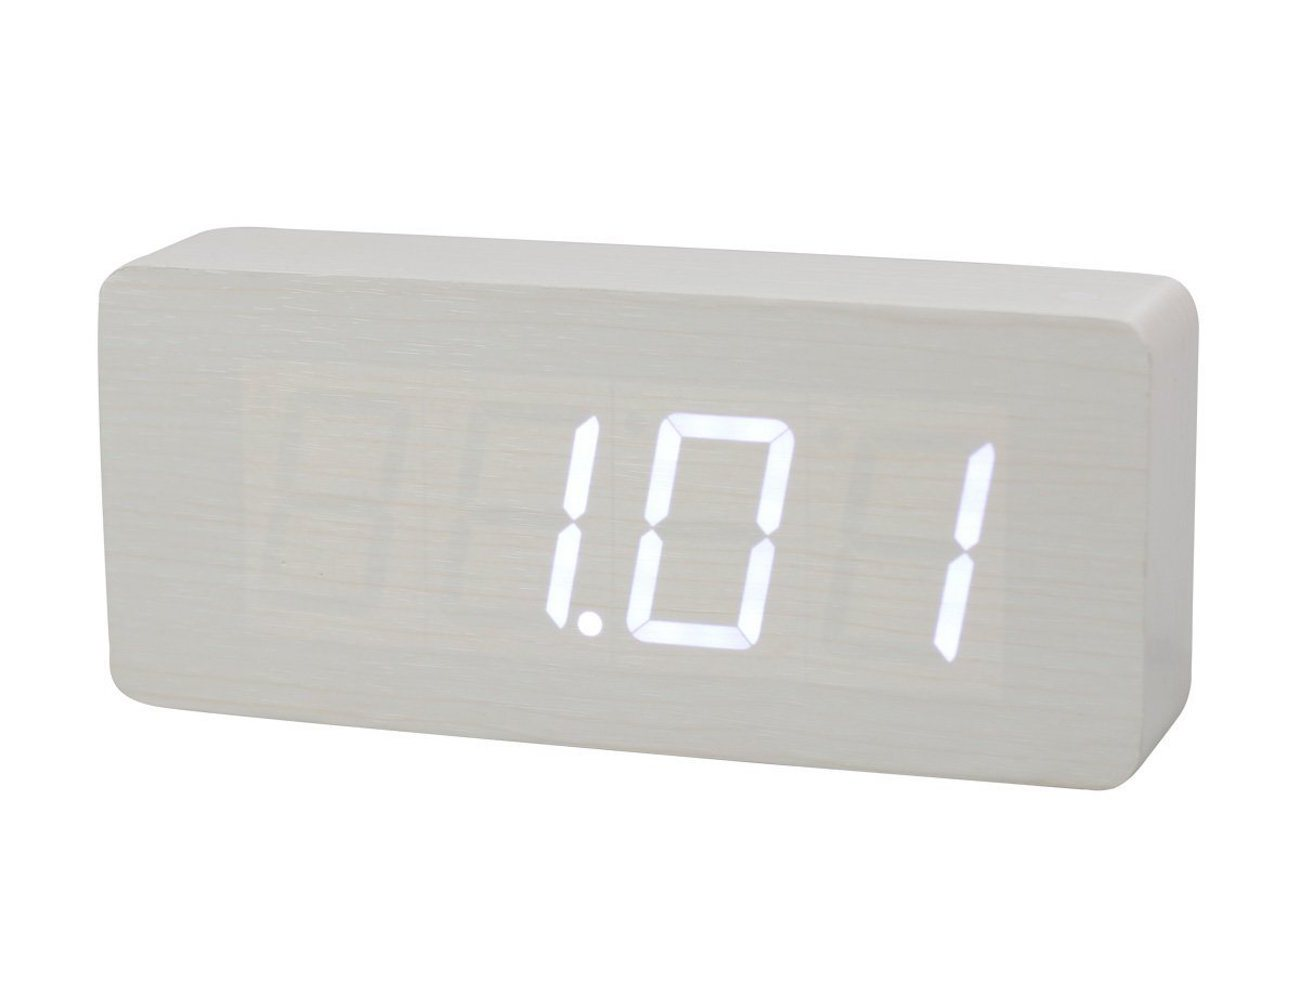 wood-grain-led-alarm-clock-04